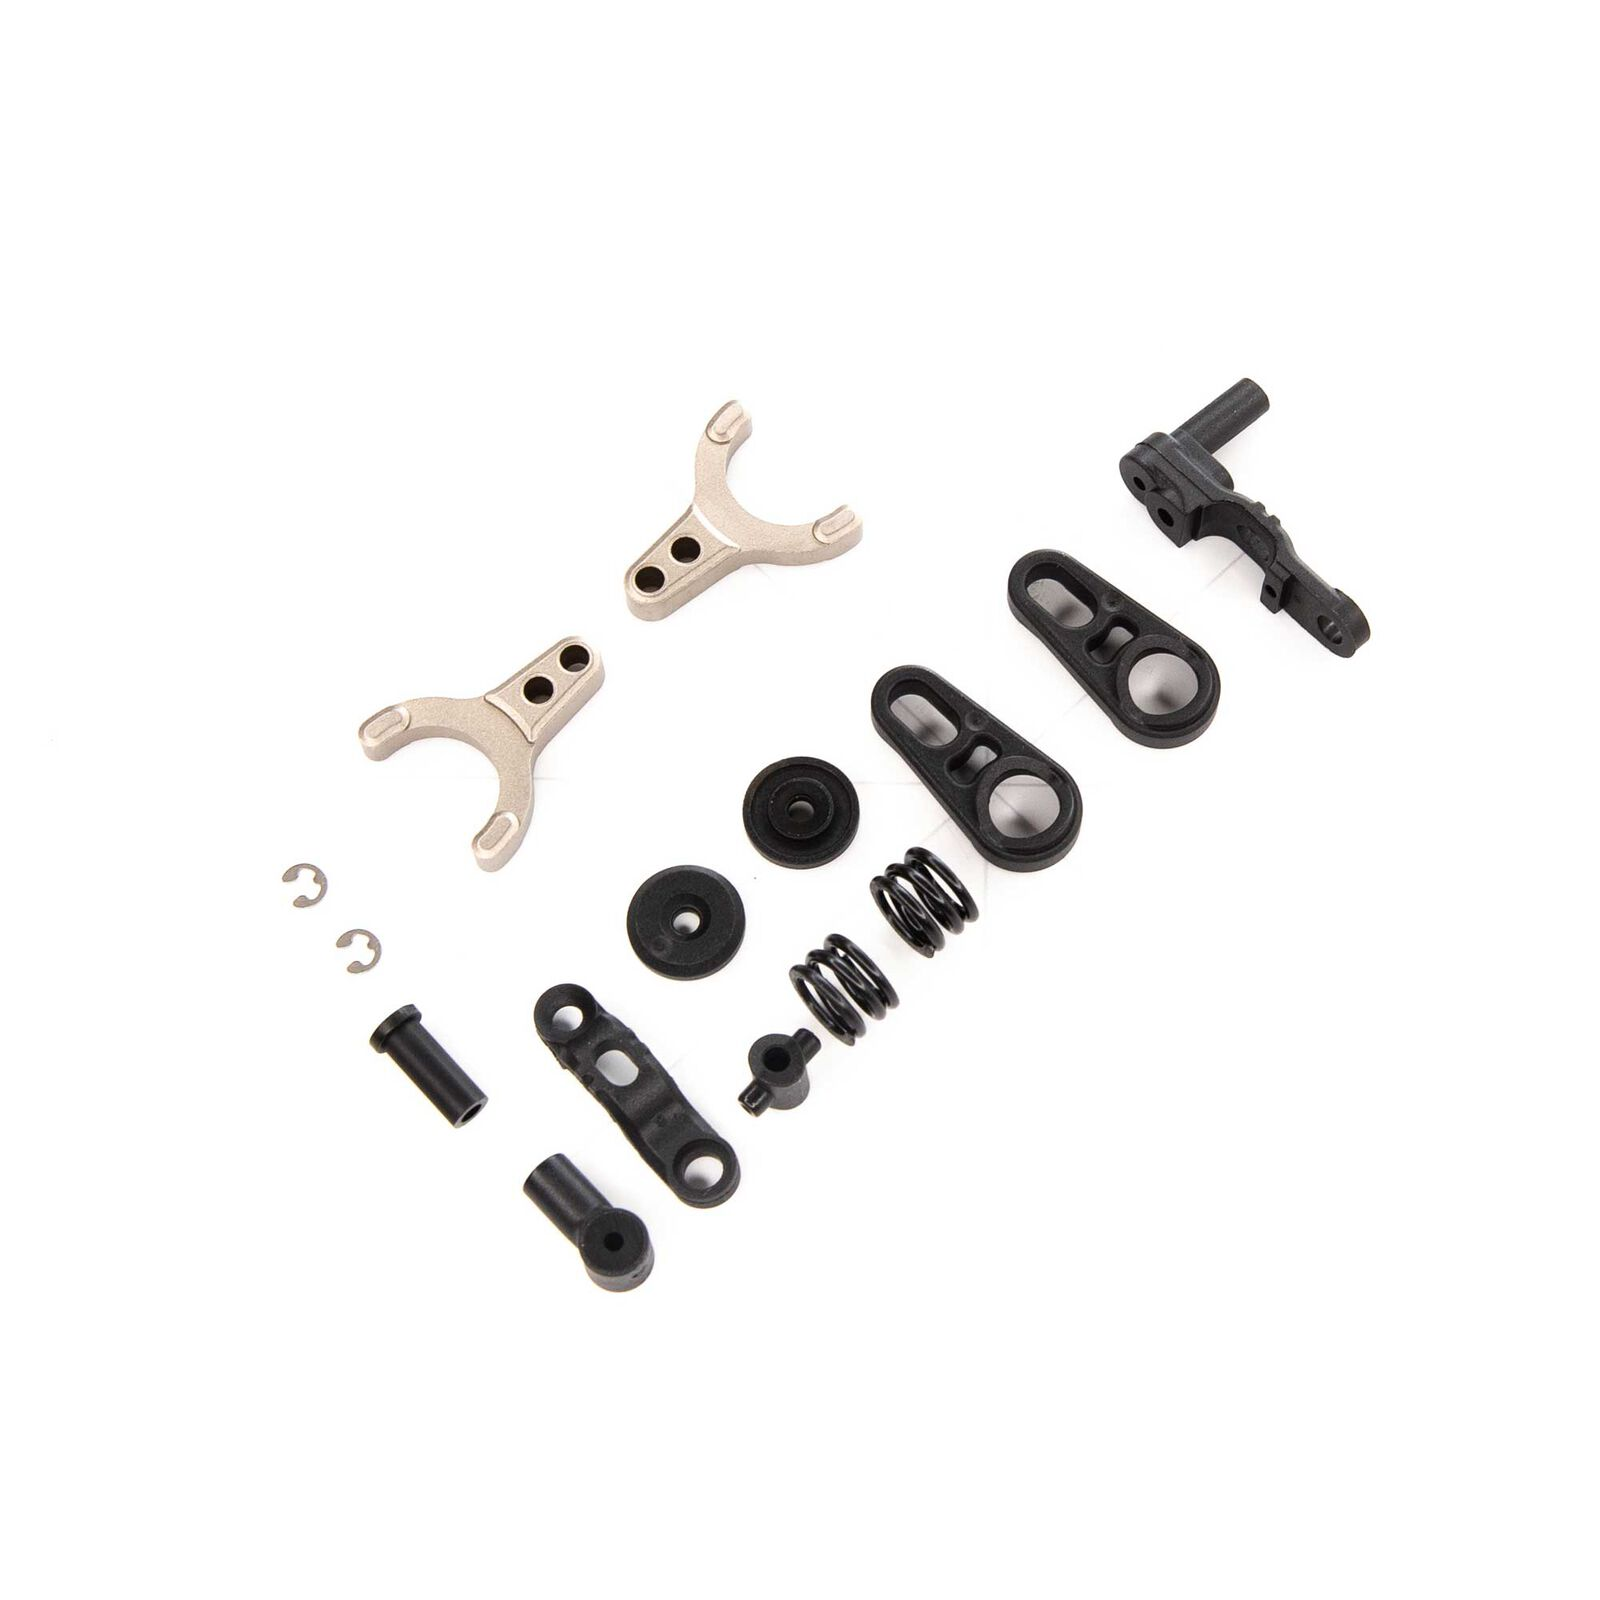 Dig 2-Speed Arm & Shaft Set: SCX10 III